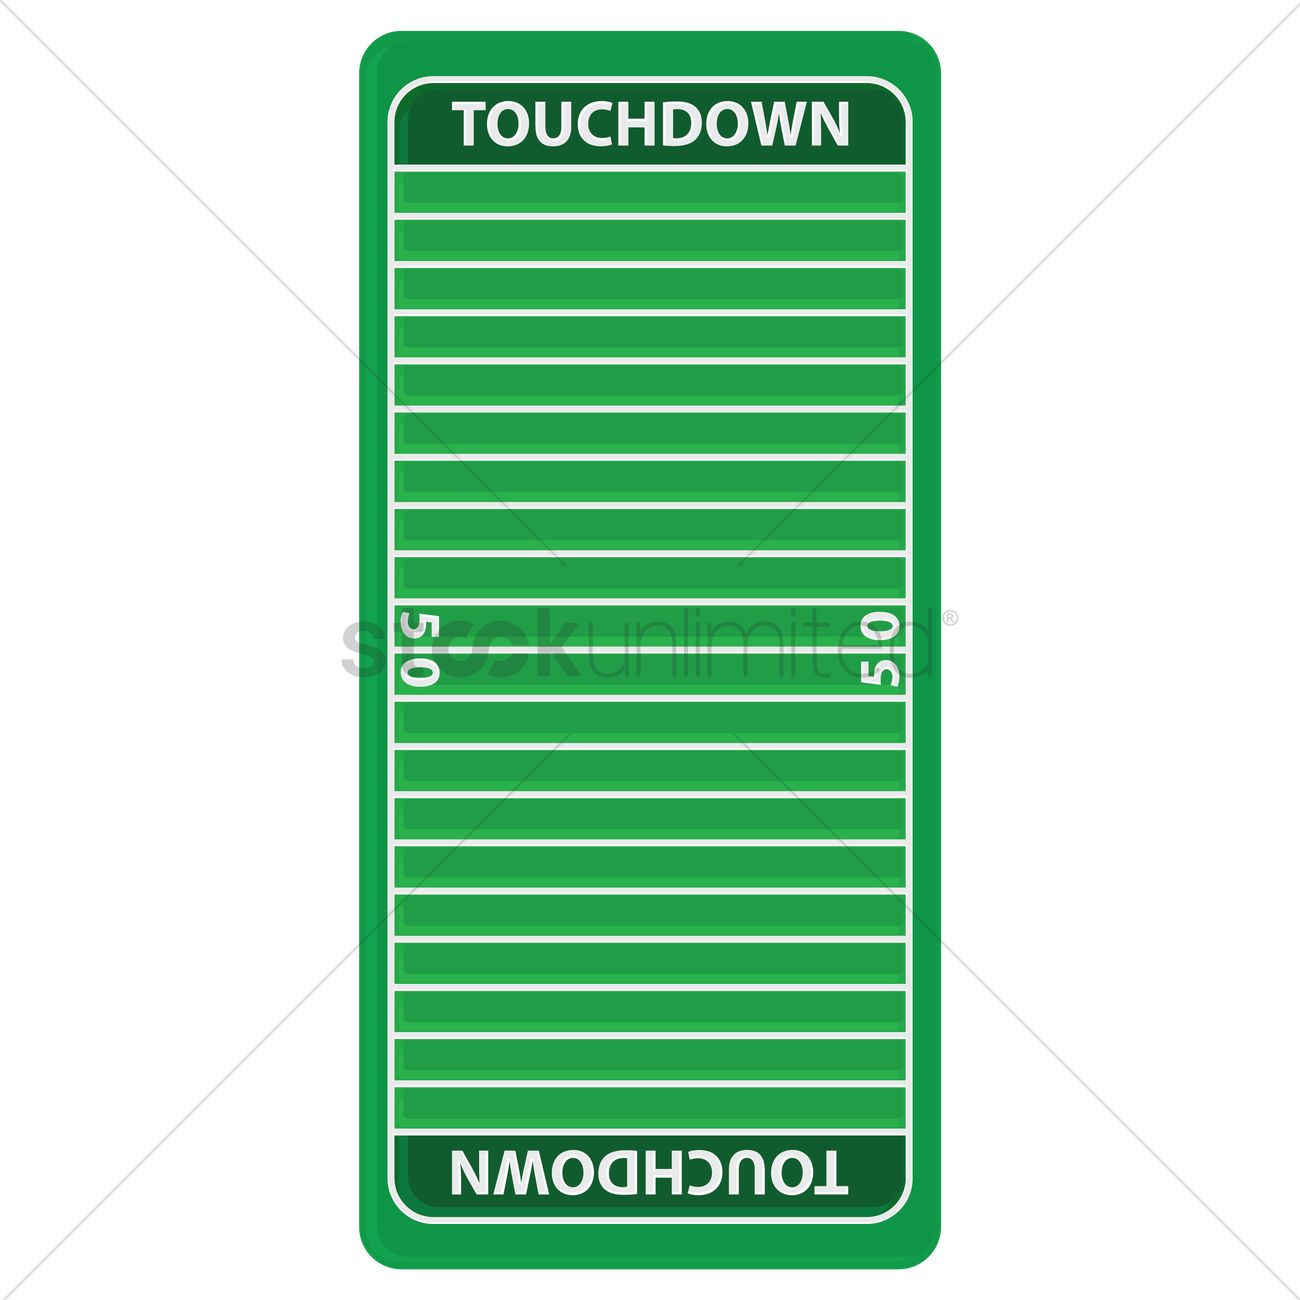 american football field vector image 1485869 stockunlimited rh stockunlimited com football field vector file football field vector free download